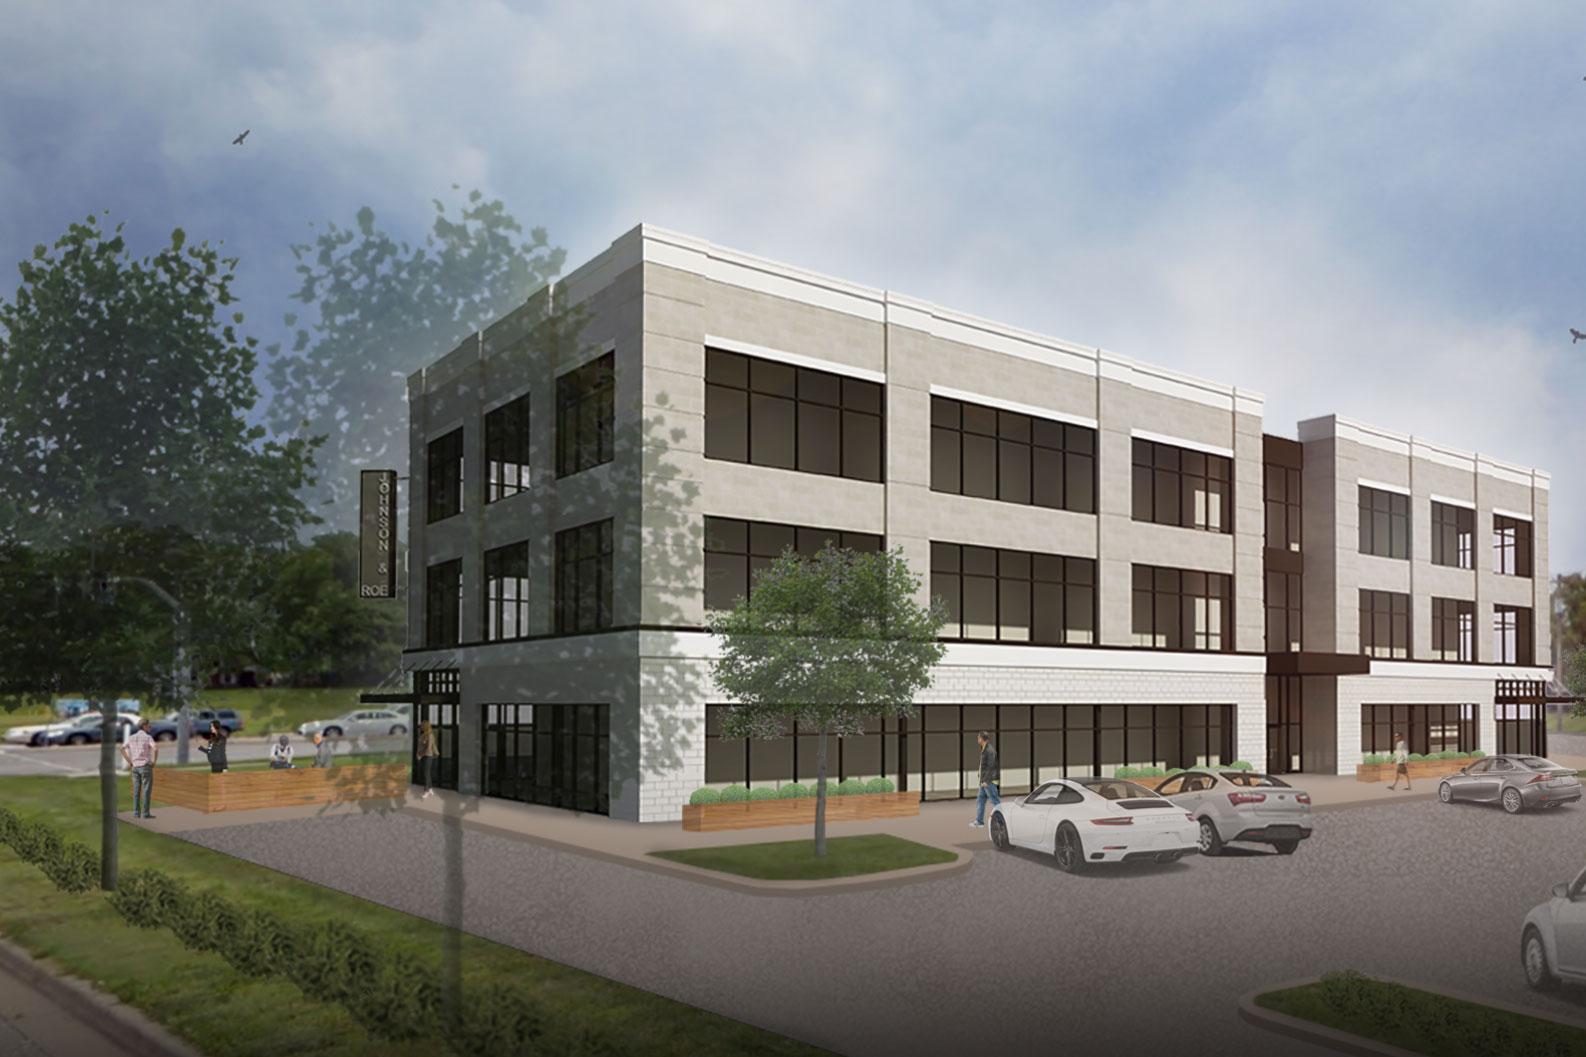 Roeland Park advances preliminary concept for mixed-use